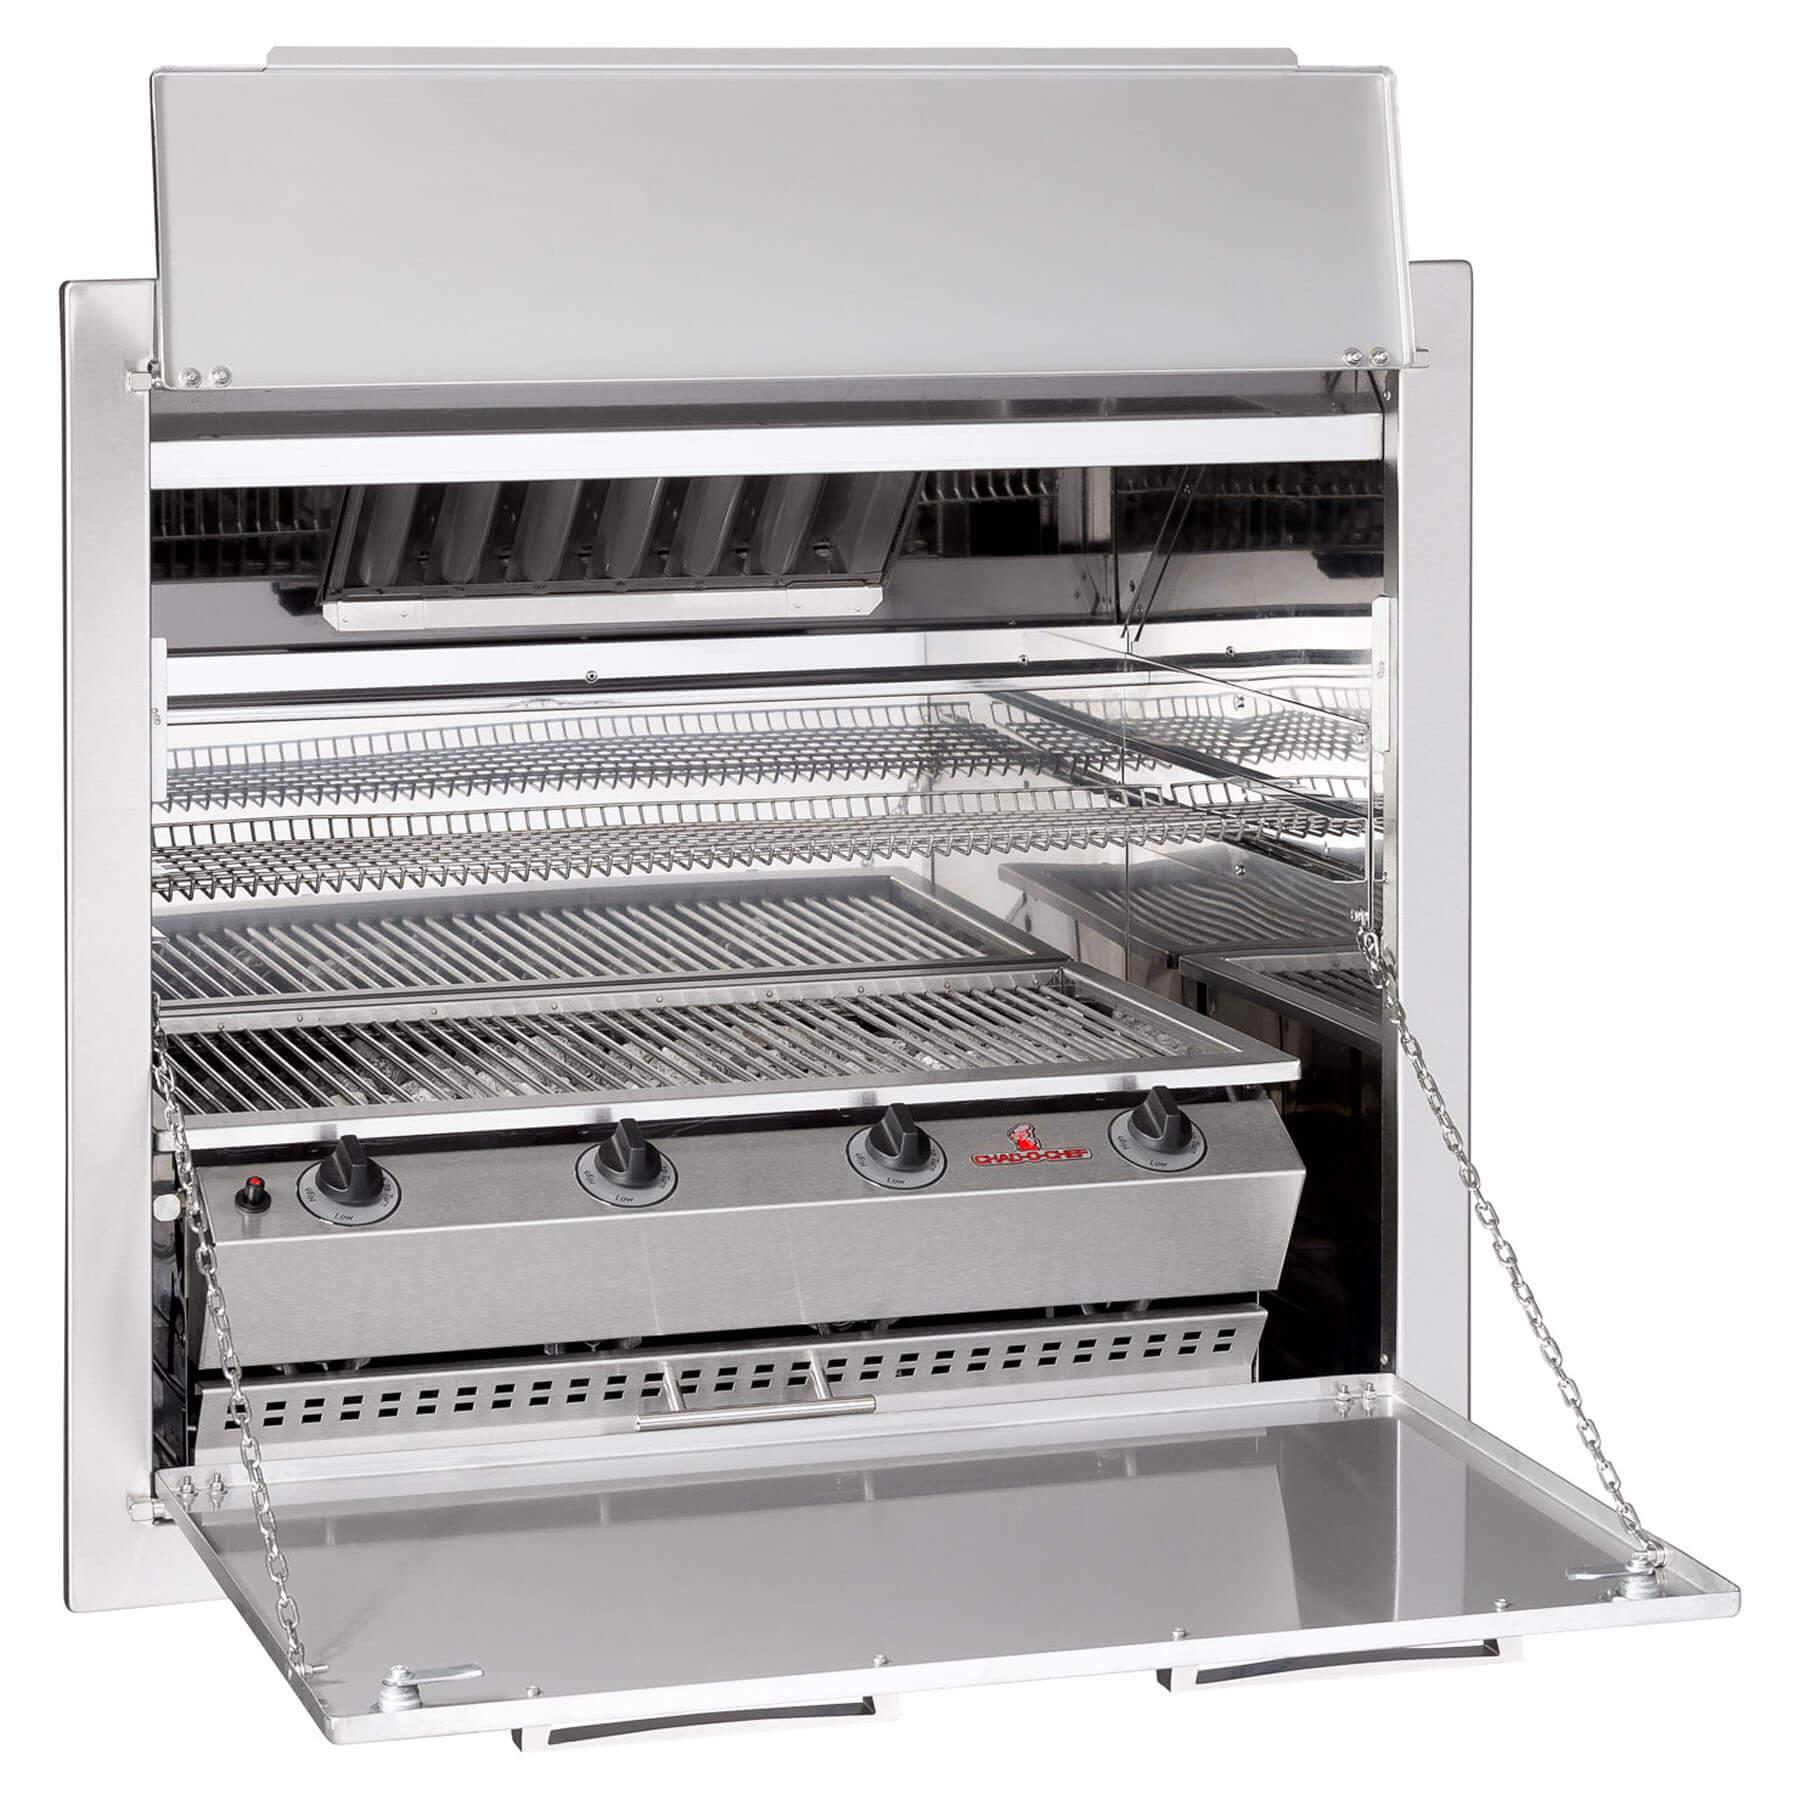 Braais-Gas-4-Burner-Standard-Entertainer-Forced-Draught-Warmer-Tray